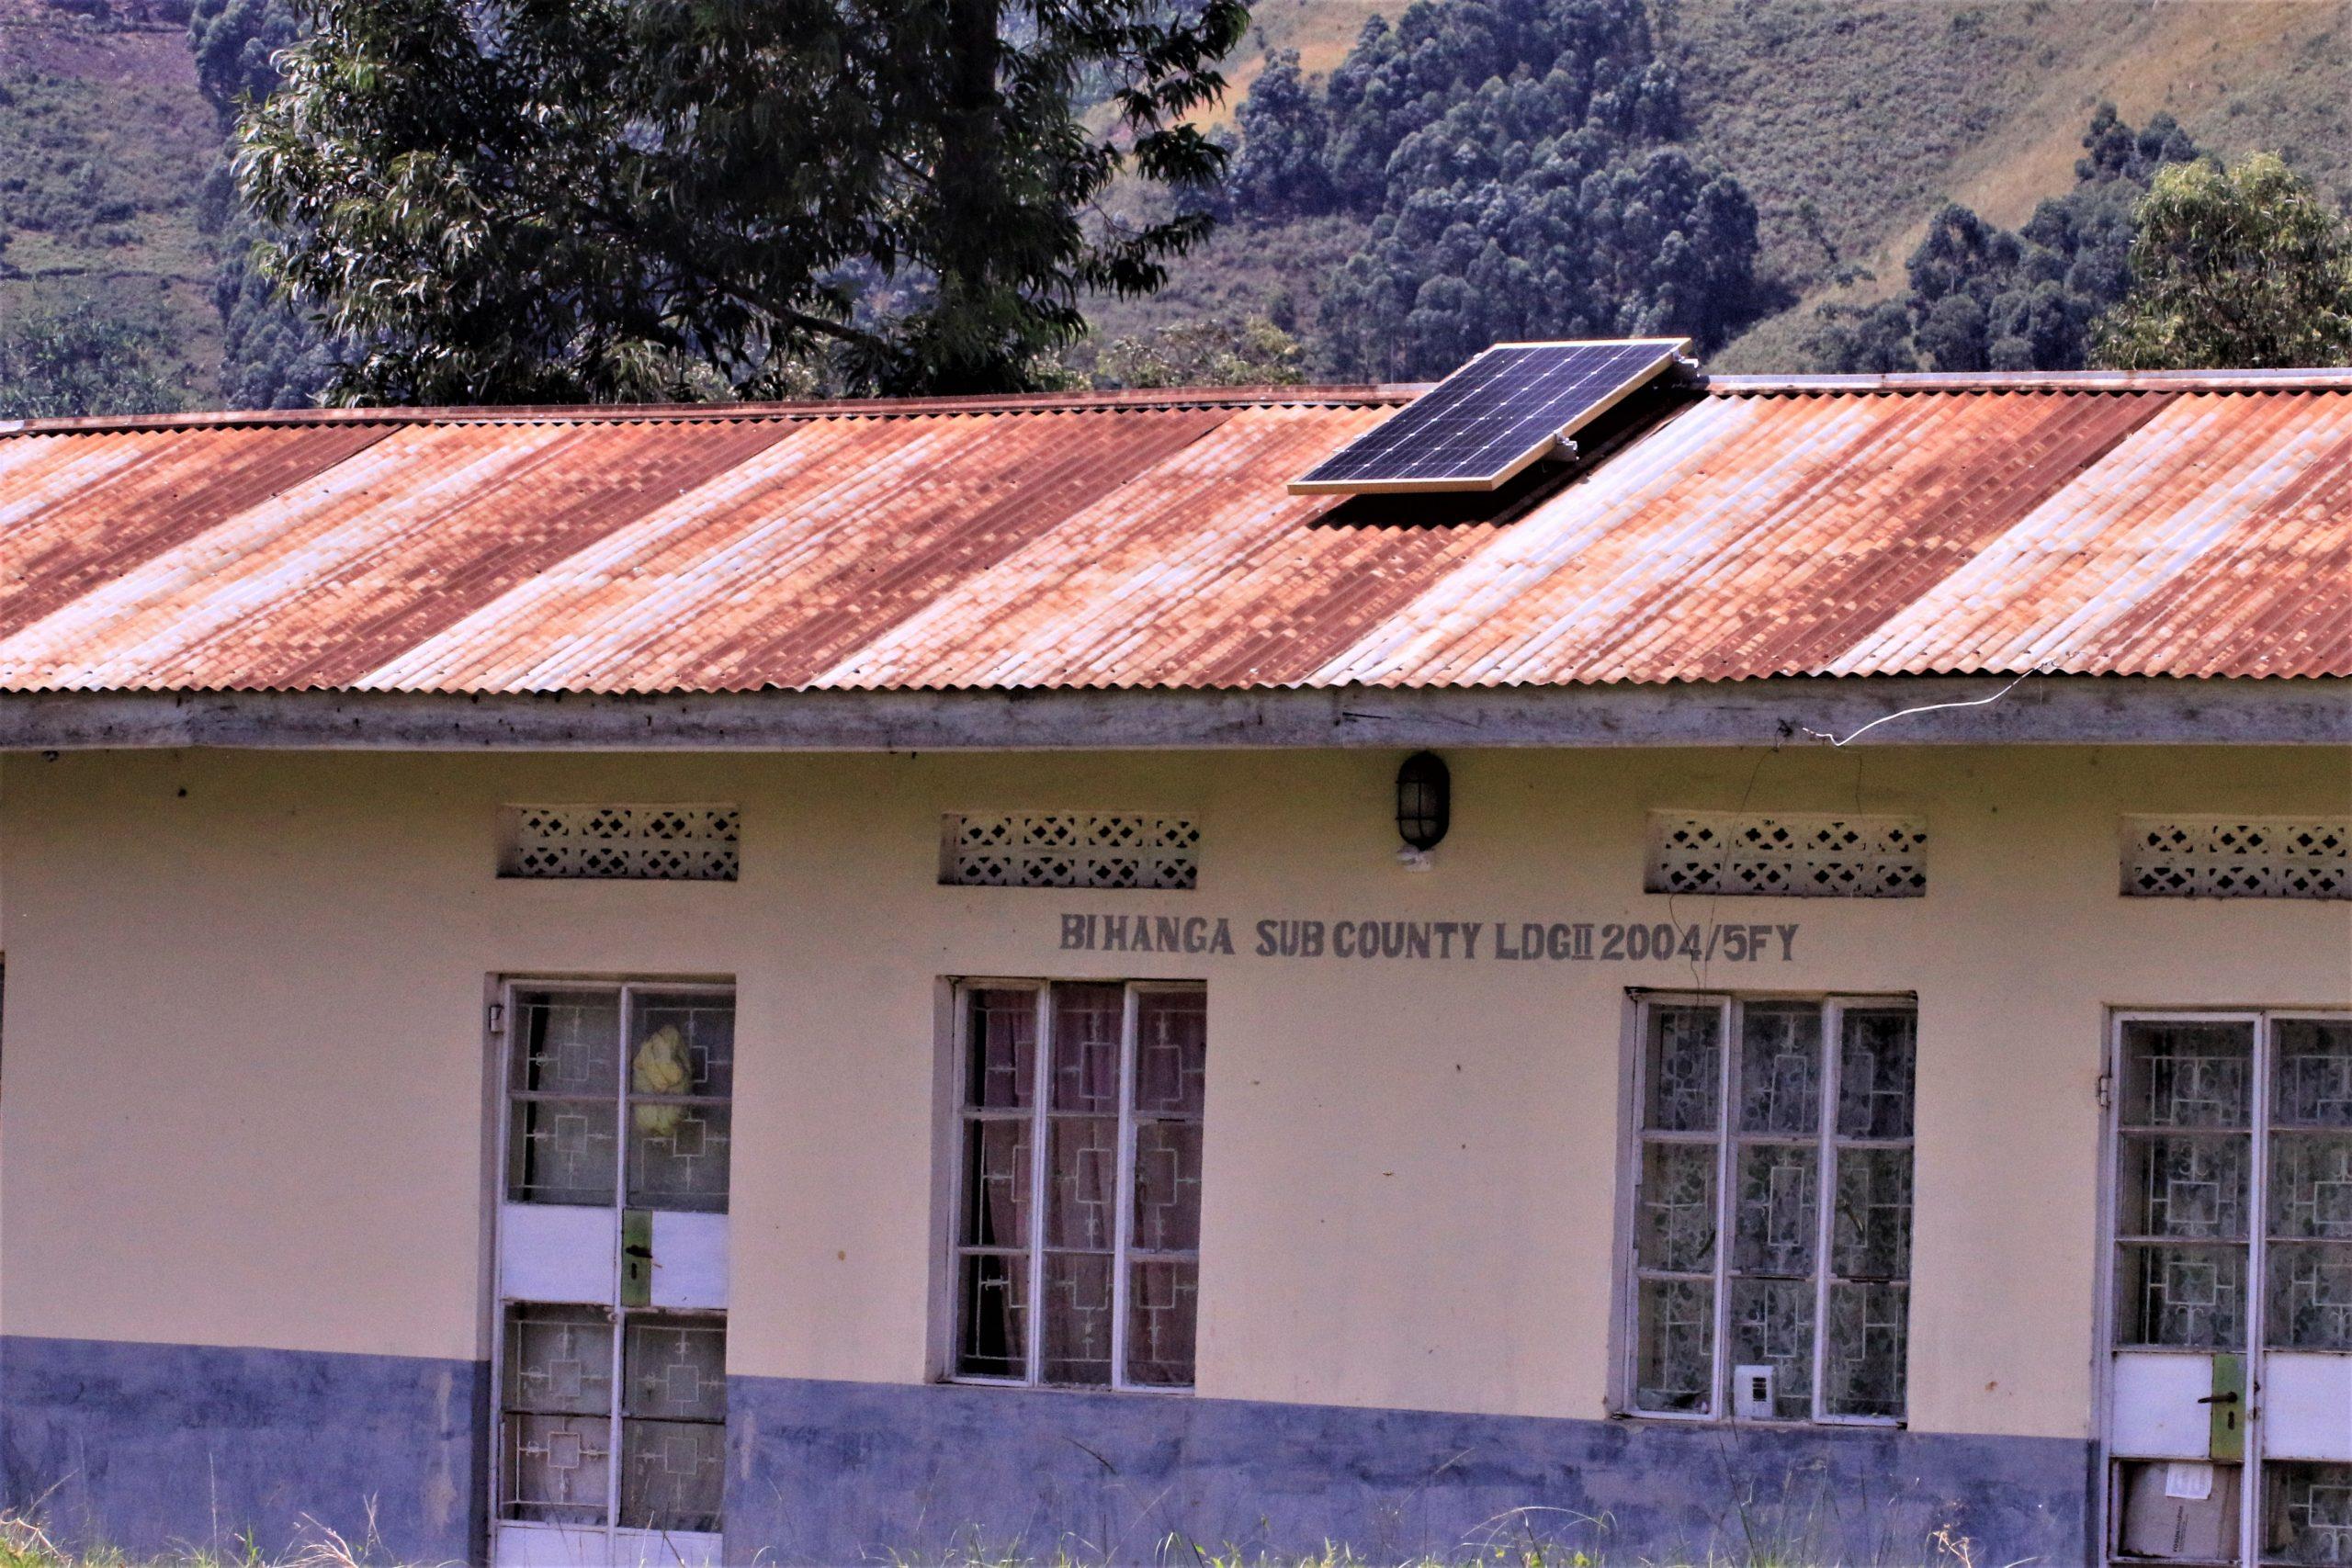 Amidst covid19 pandemic, solar energy transforms Uganda's off-grid healthcare